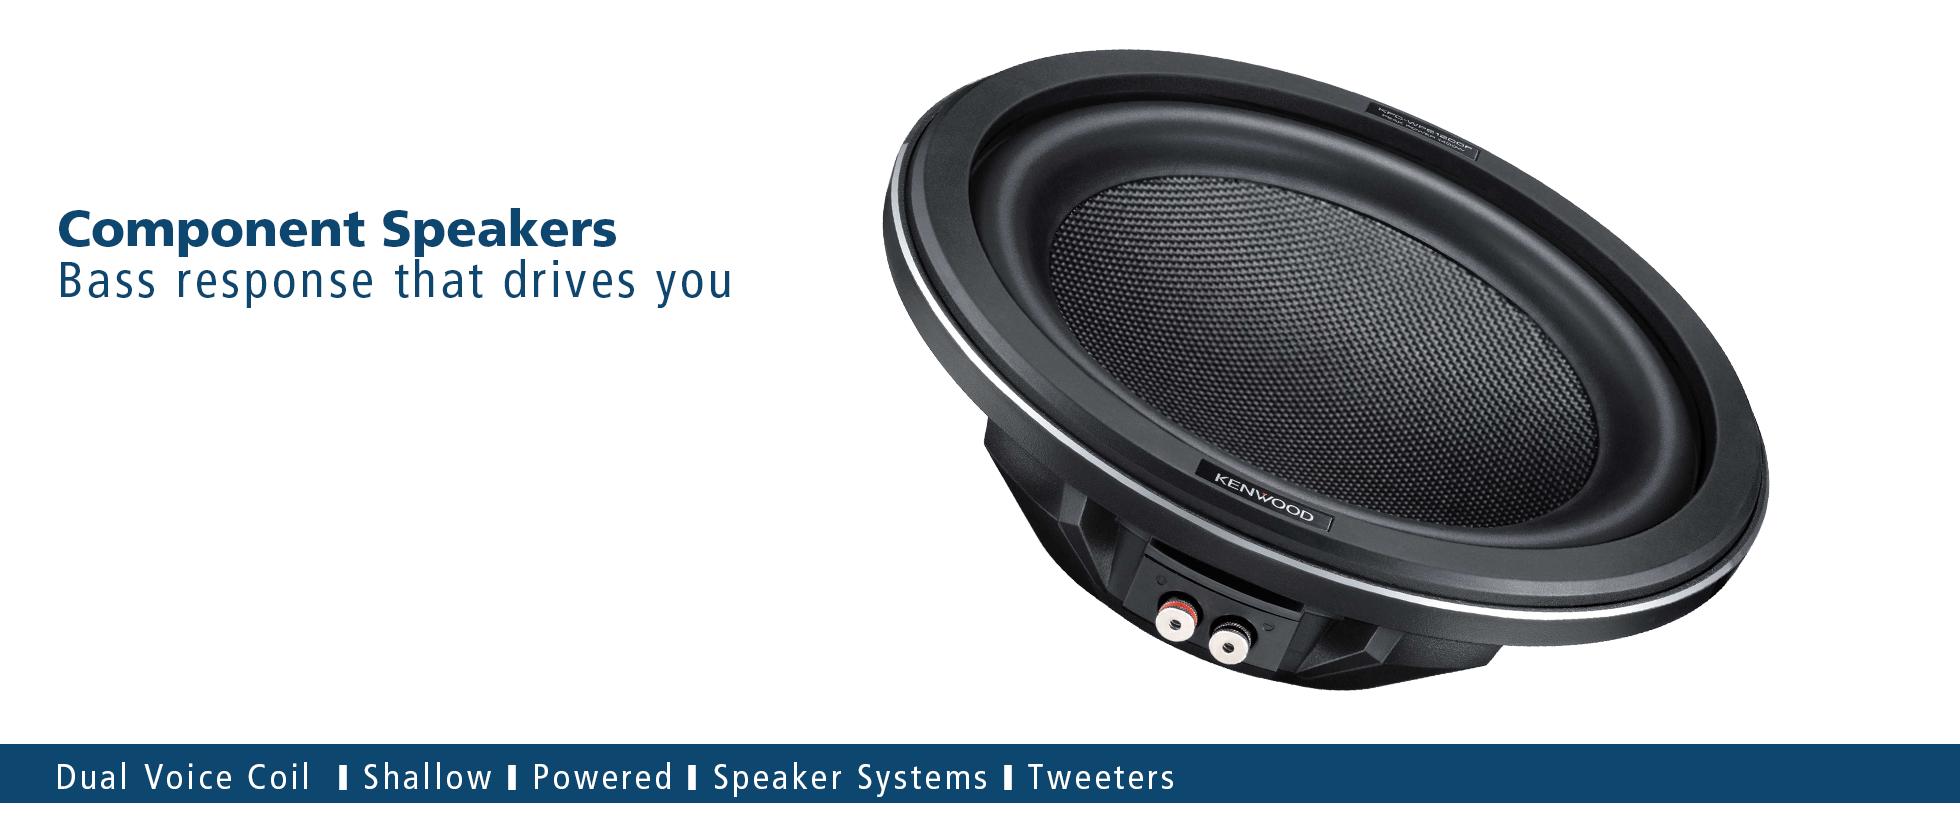 hight resolution of subs u0026 component speakers u2022 ksc sw11 features u2022 kenwood ukkenwood ksc sw11